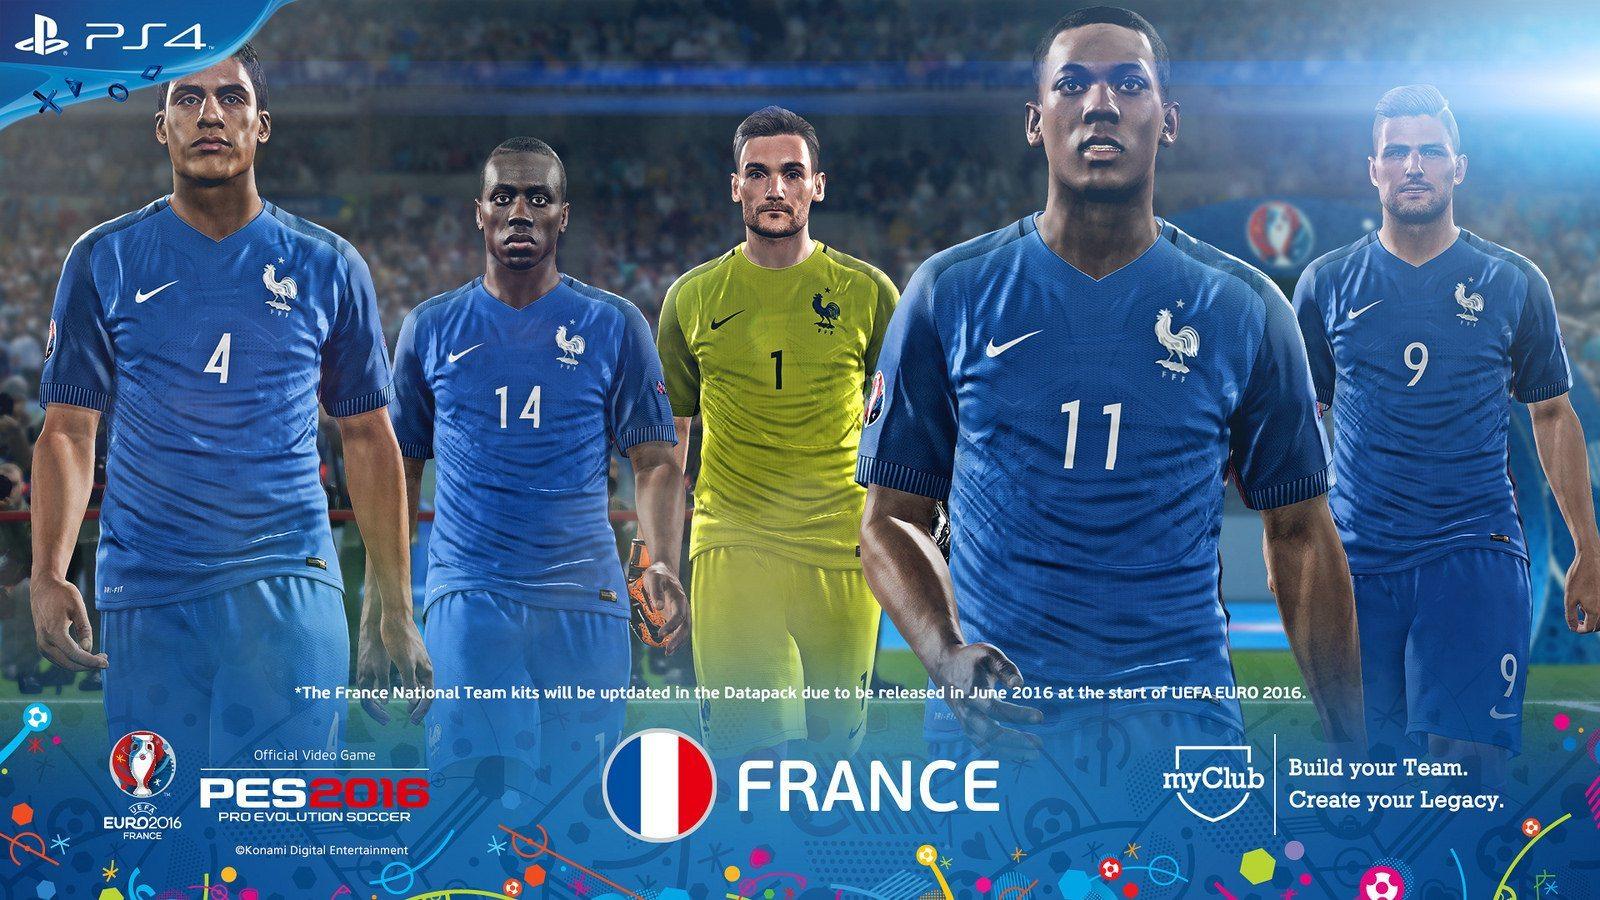 PES 2016 – UEFA Euro 2016 France